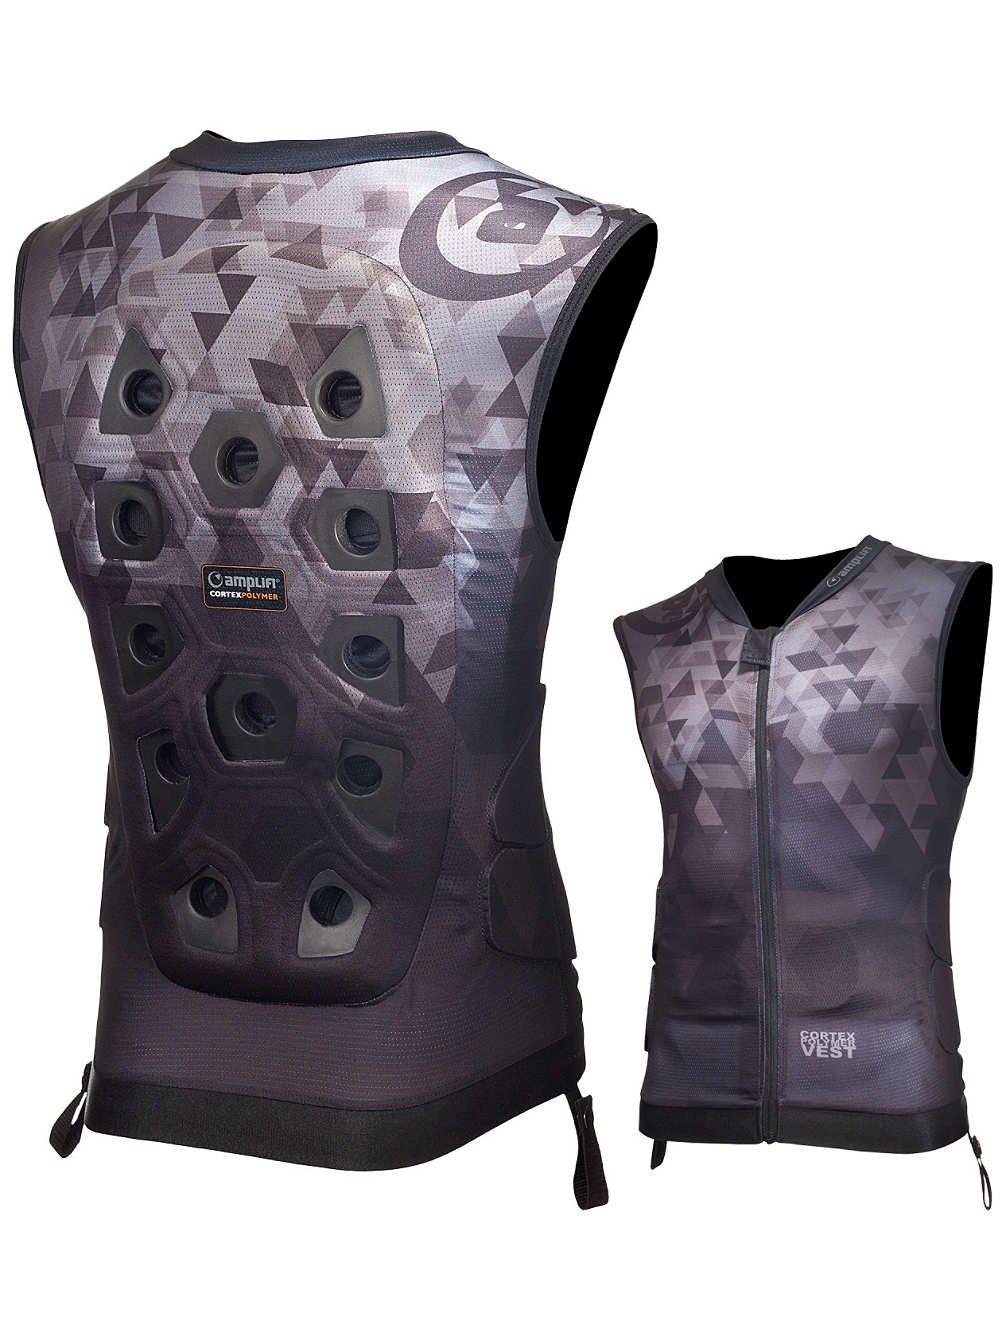 Amplifi Cortex Polymer Jacket Protector schwarz 2019 2019 2019 Protektor B06XS4QPYQ Schutzkleidung Große Auswahl 67a4cf